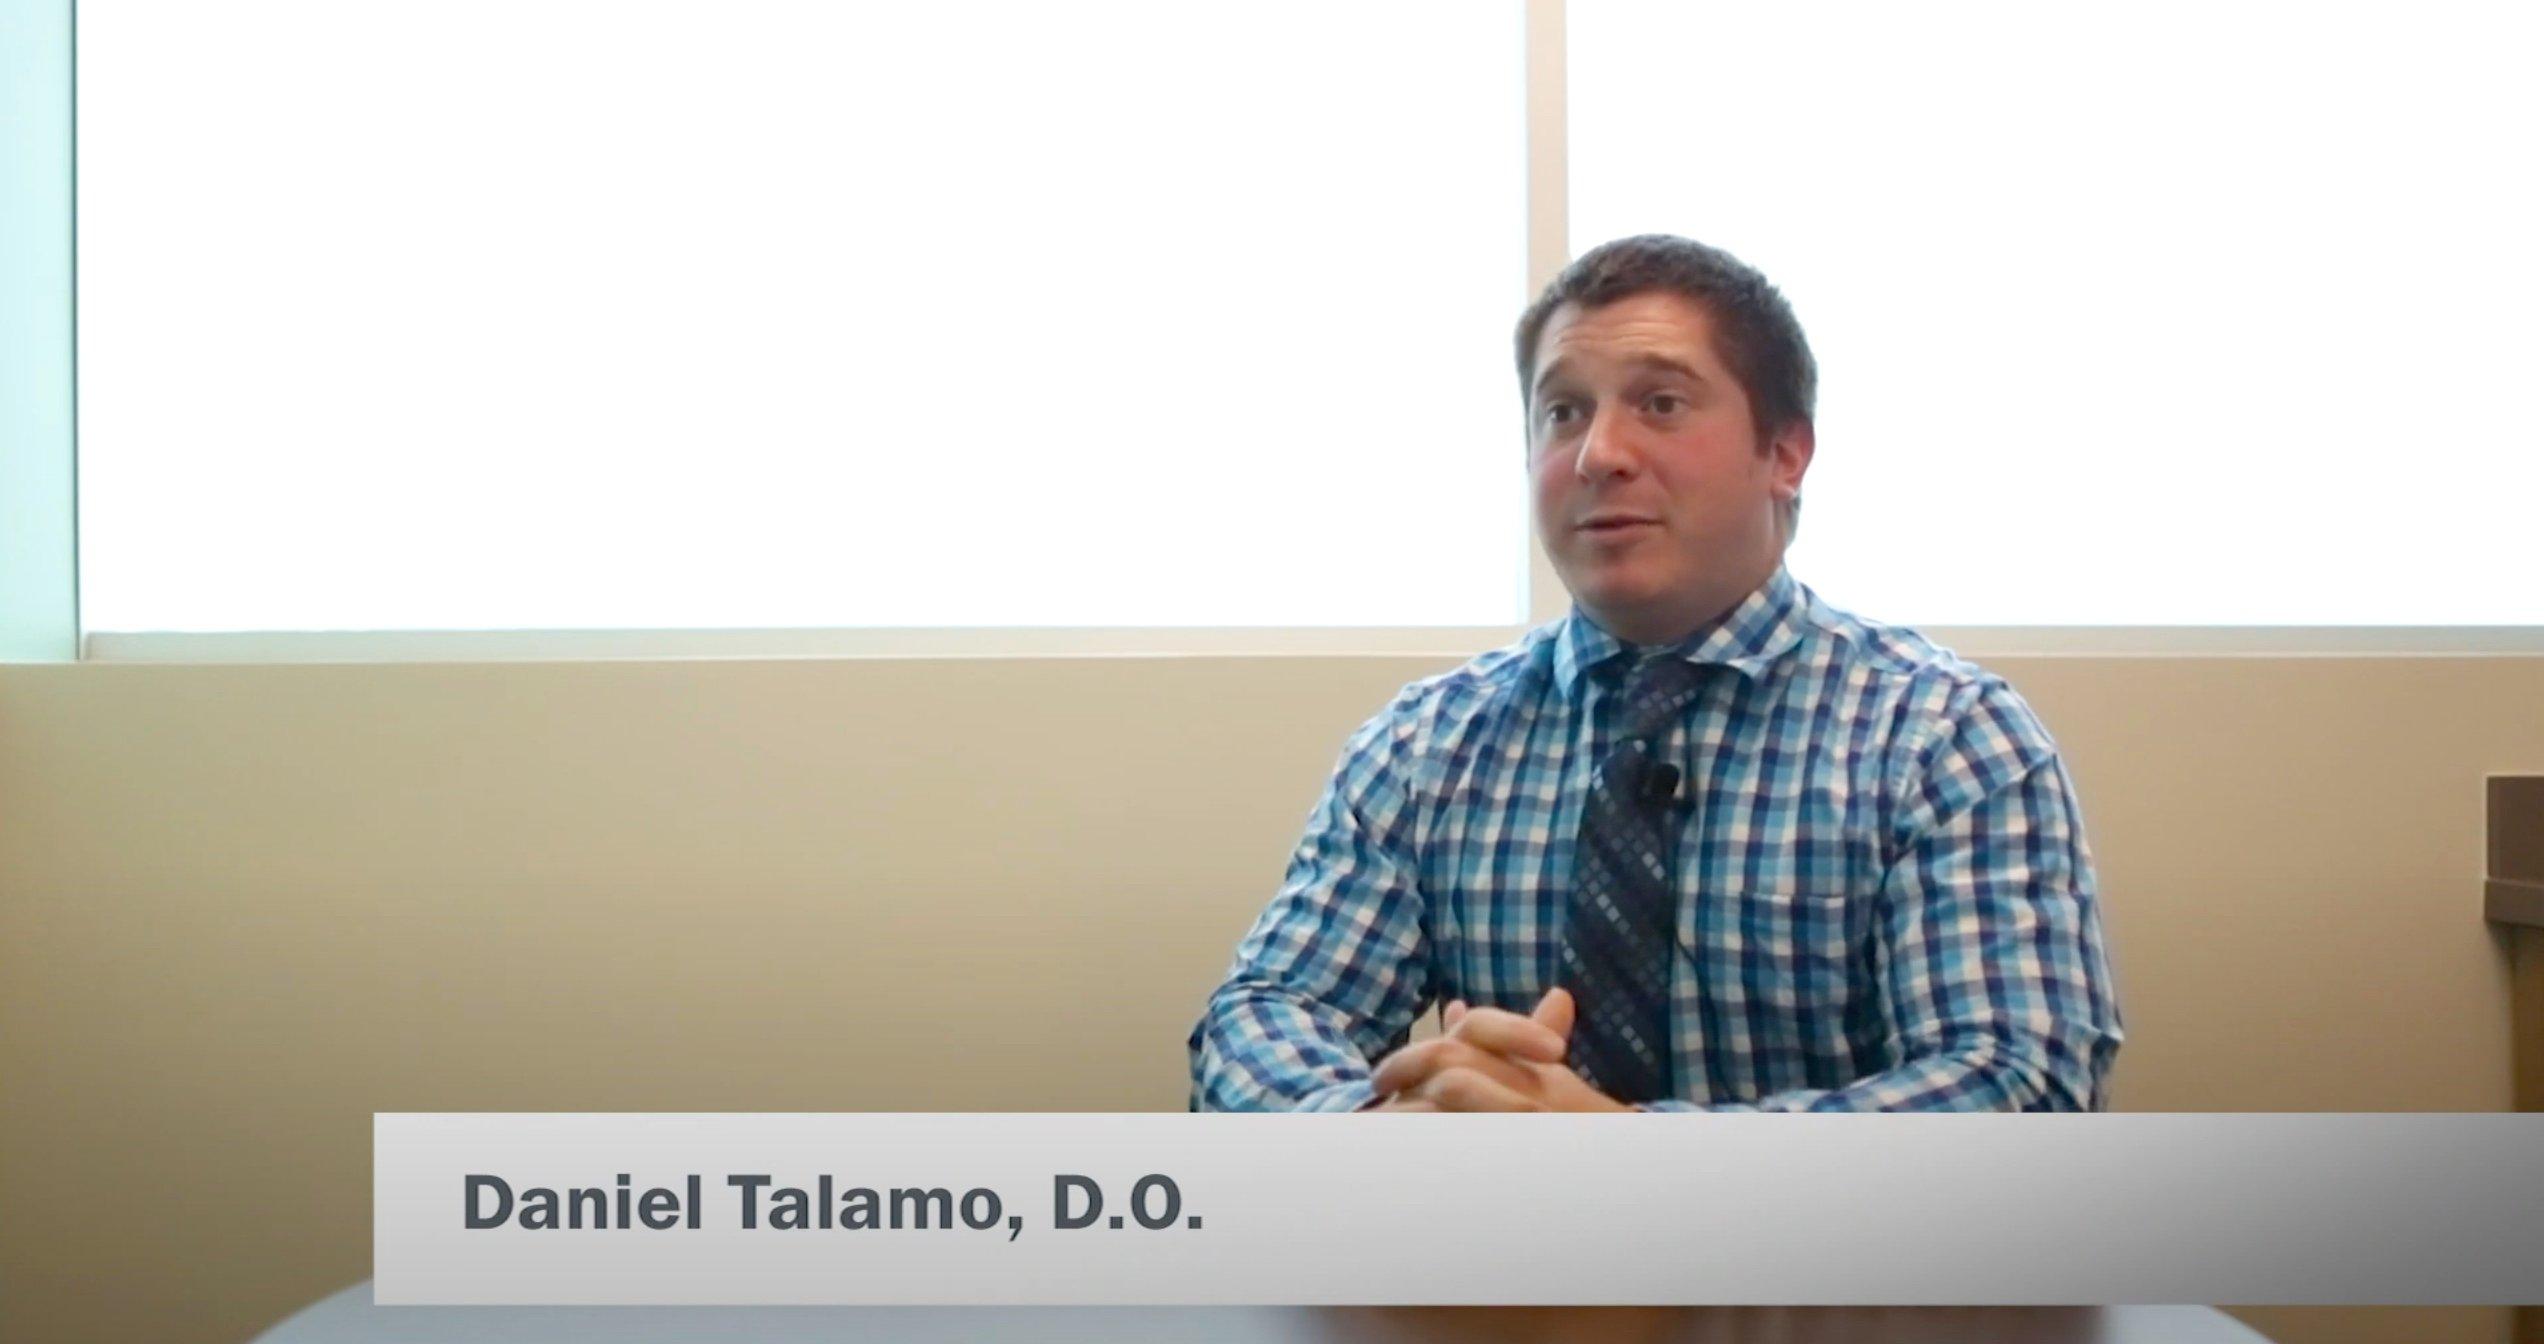 Dr. Daniel Talamo on using PracticeLink